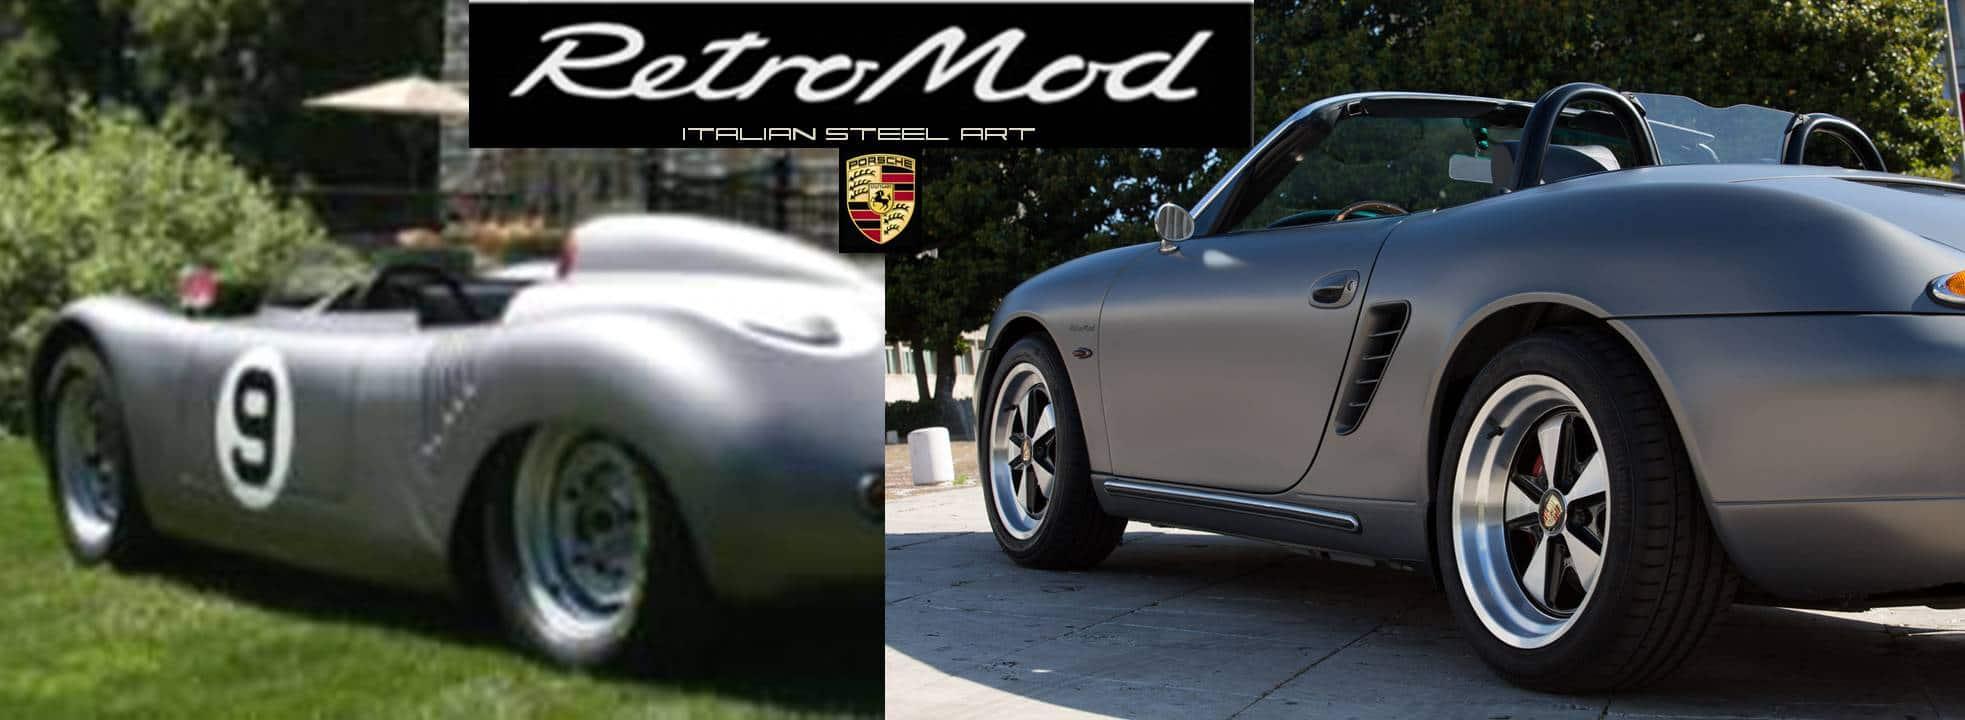 Porsche Boxster RetroMod comparison